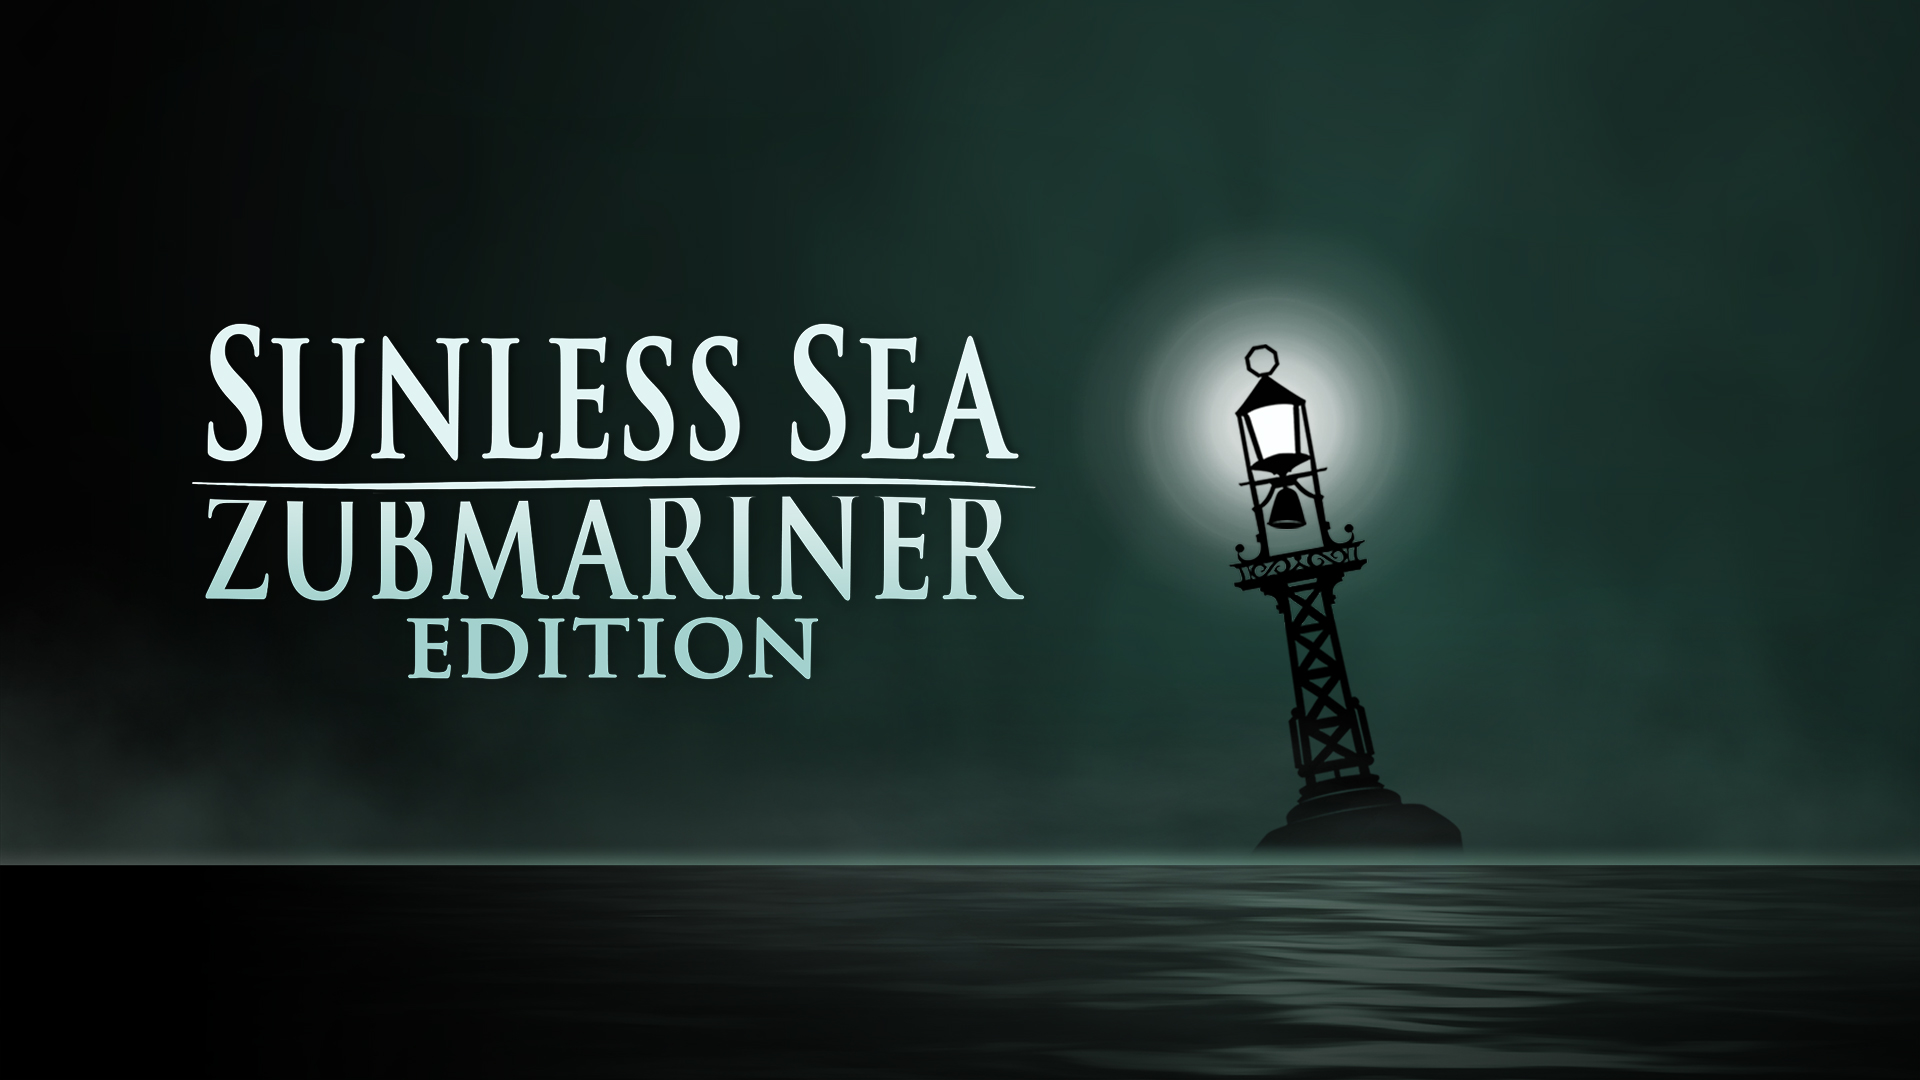 sunless-sea-zubmariner-edition-switch-hero.jpg